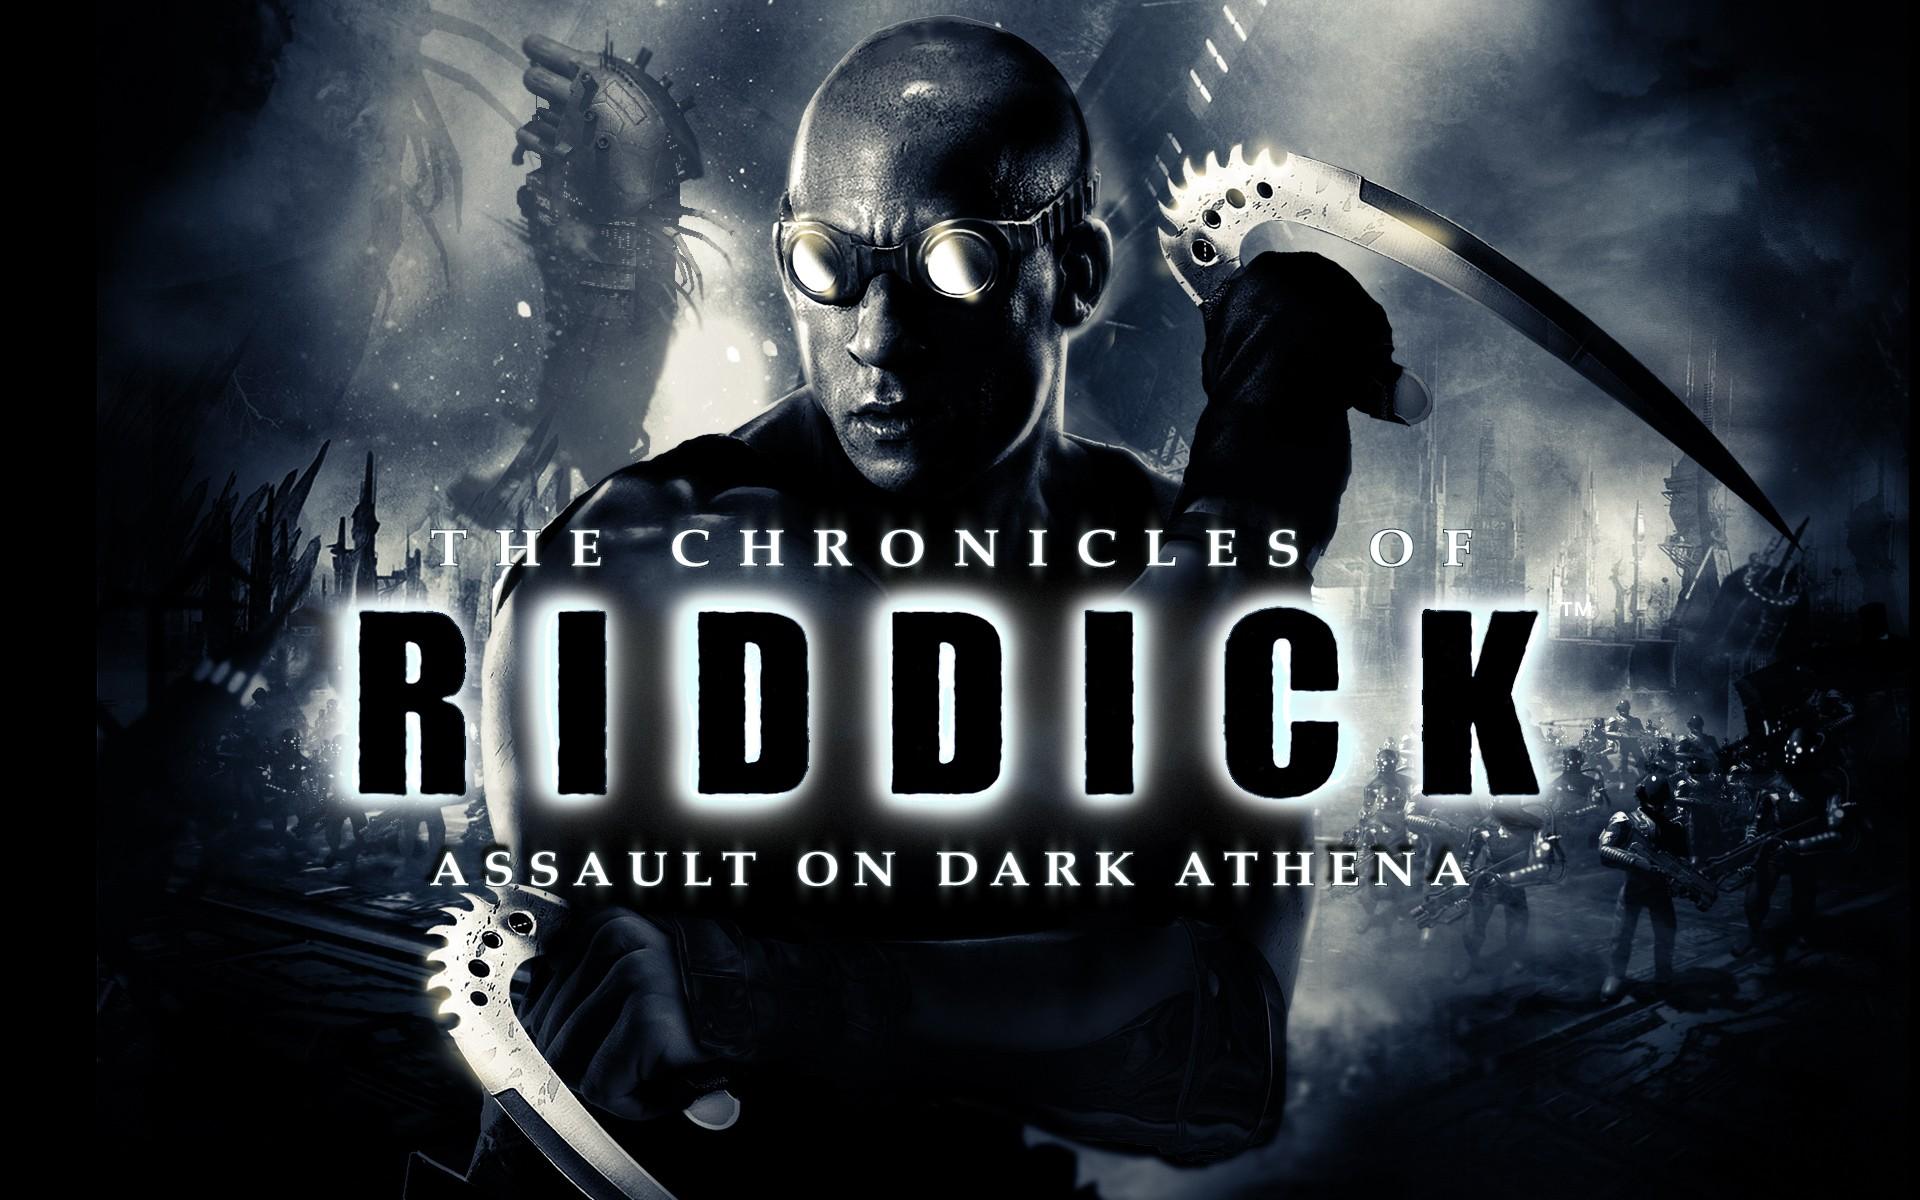 chronicles-of-riddick-assault-on-dark-athena